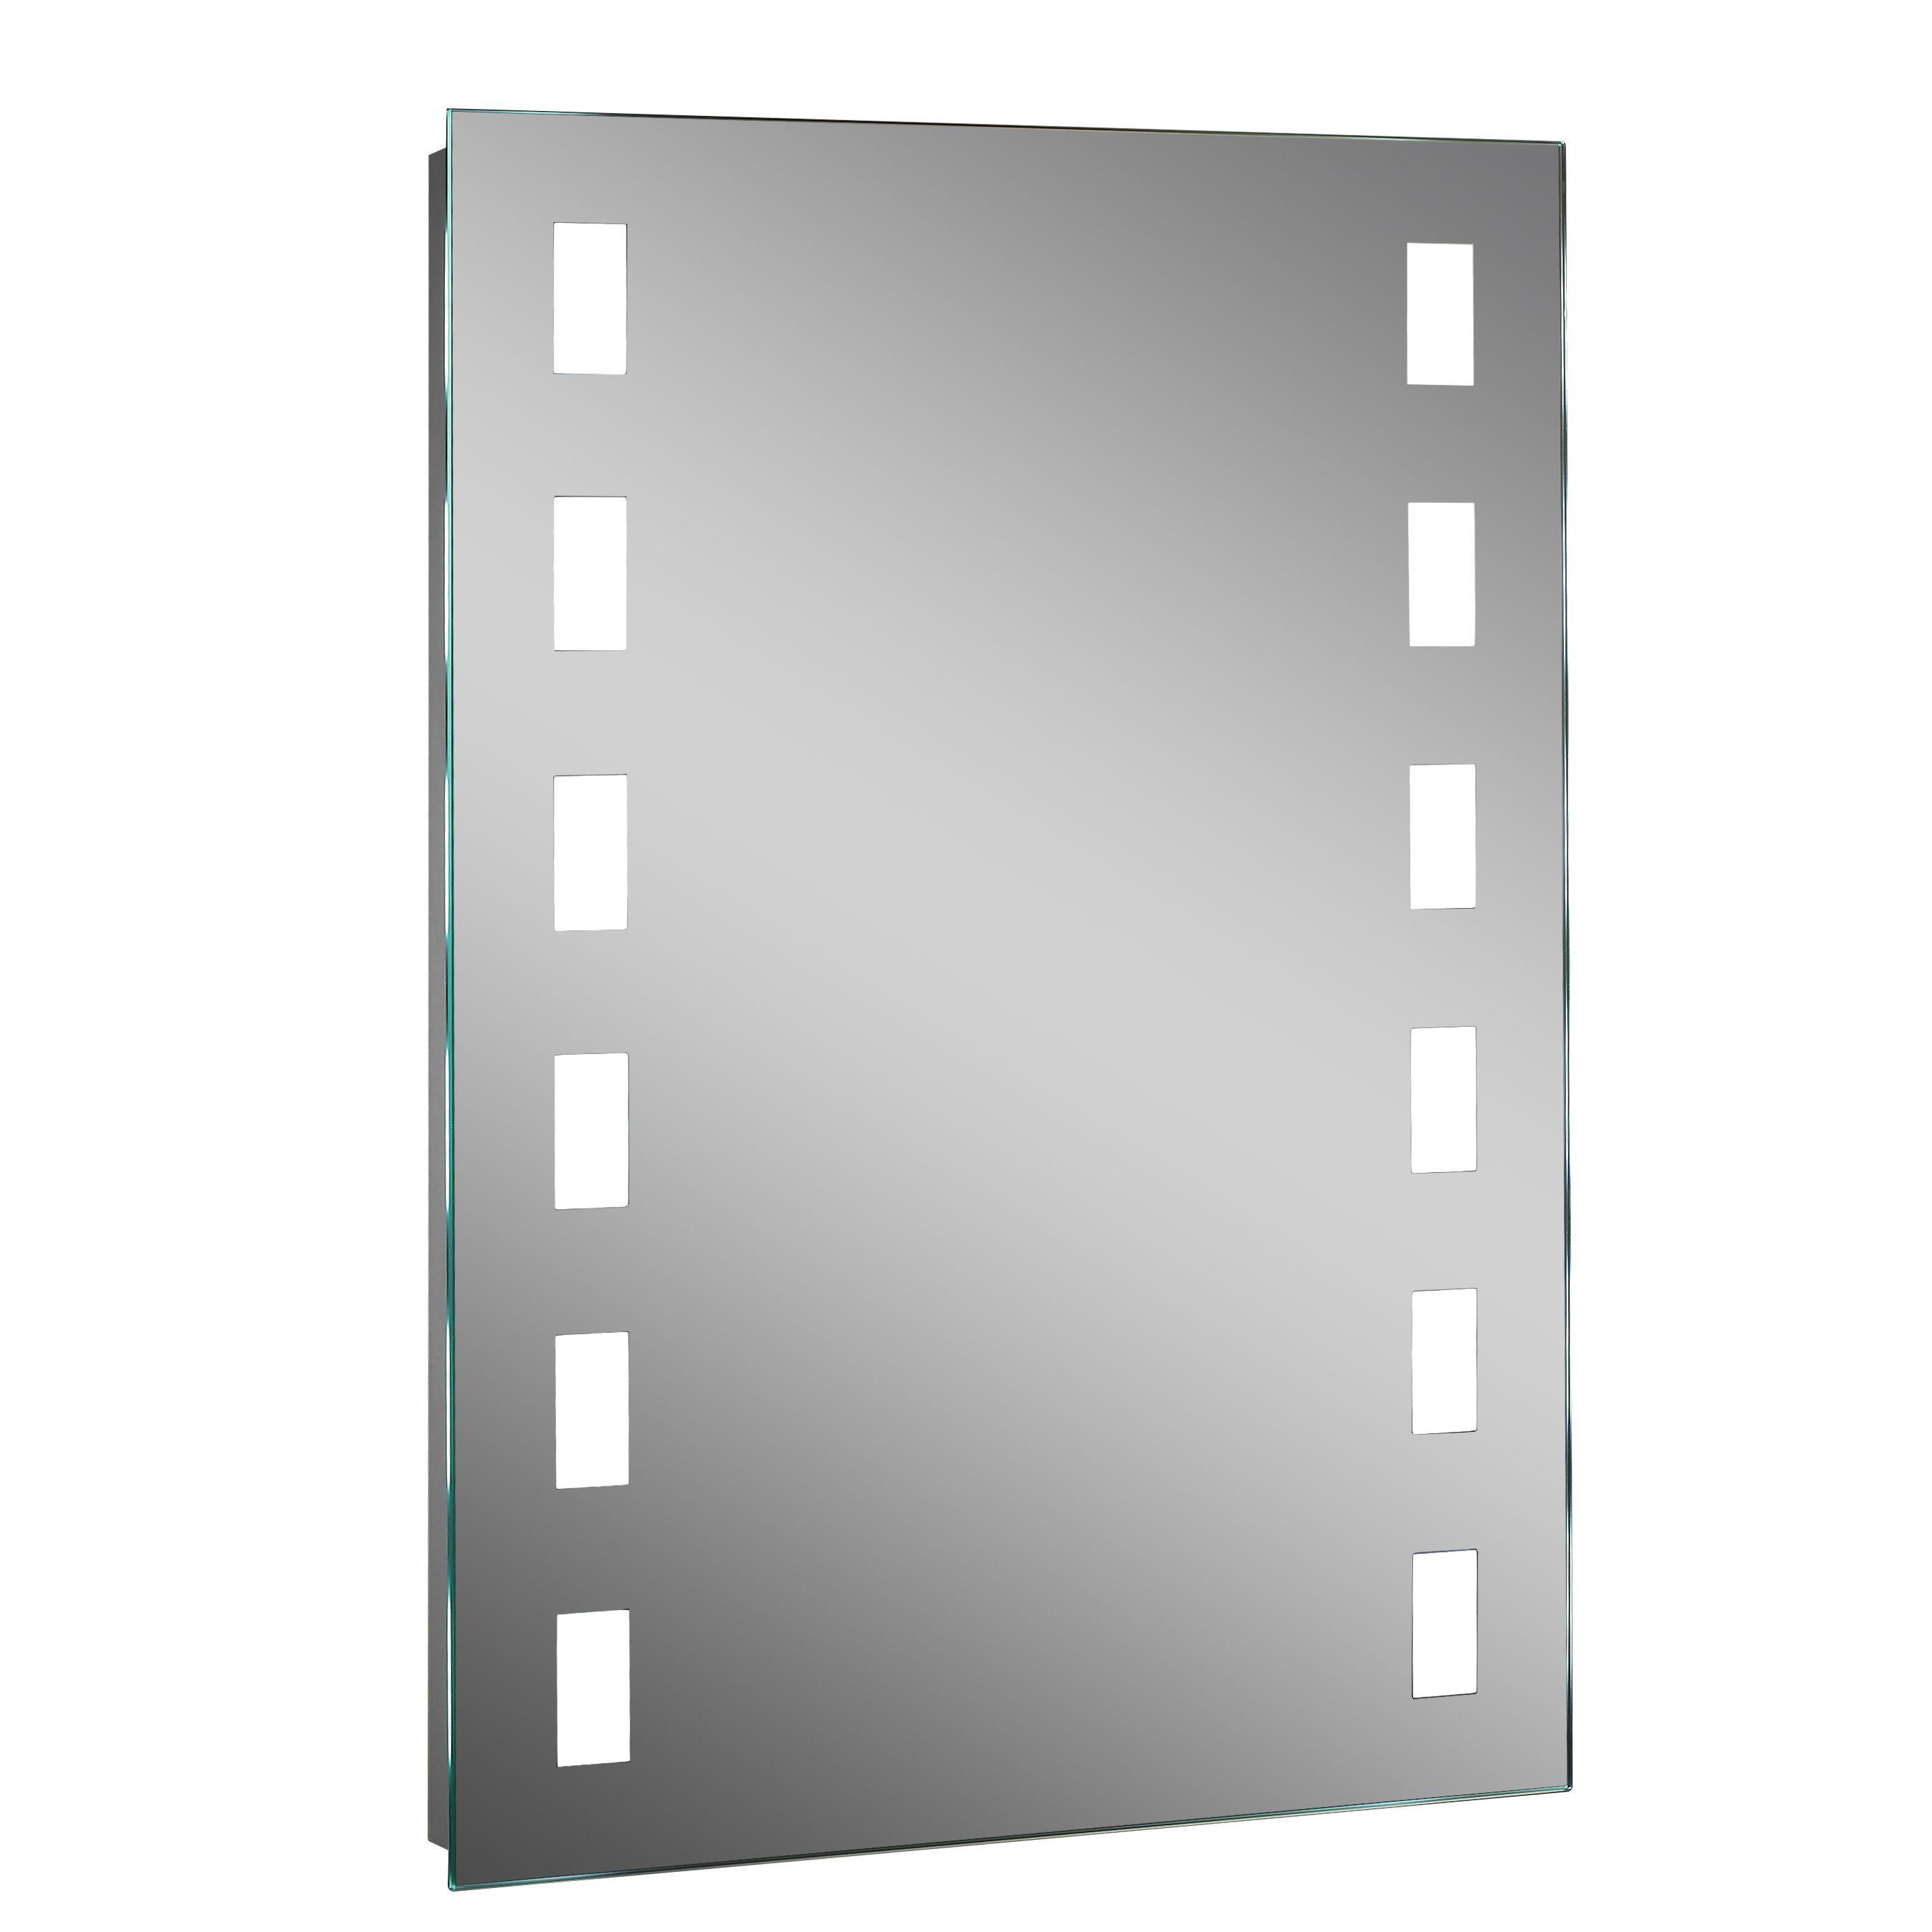 Lumino Altus Illuminated Bathroom Rectangular Mirror With Shaver Socket (w)500mm (h)700mm